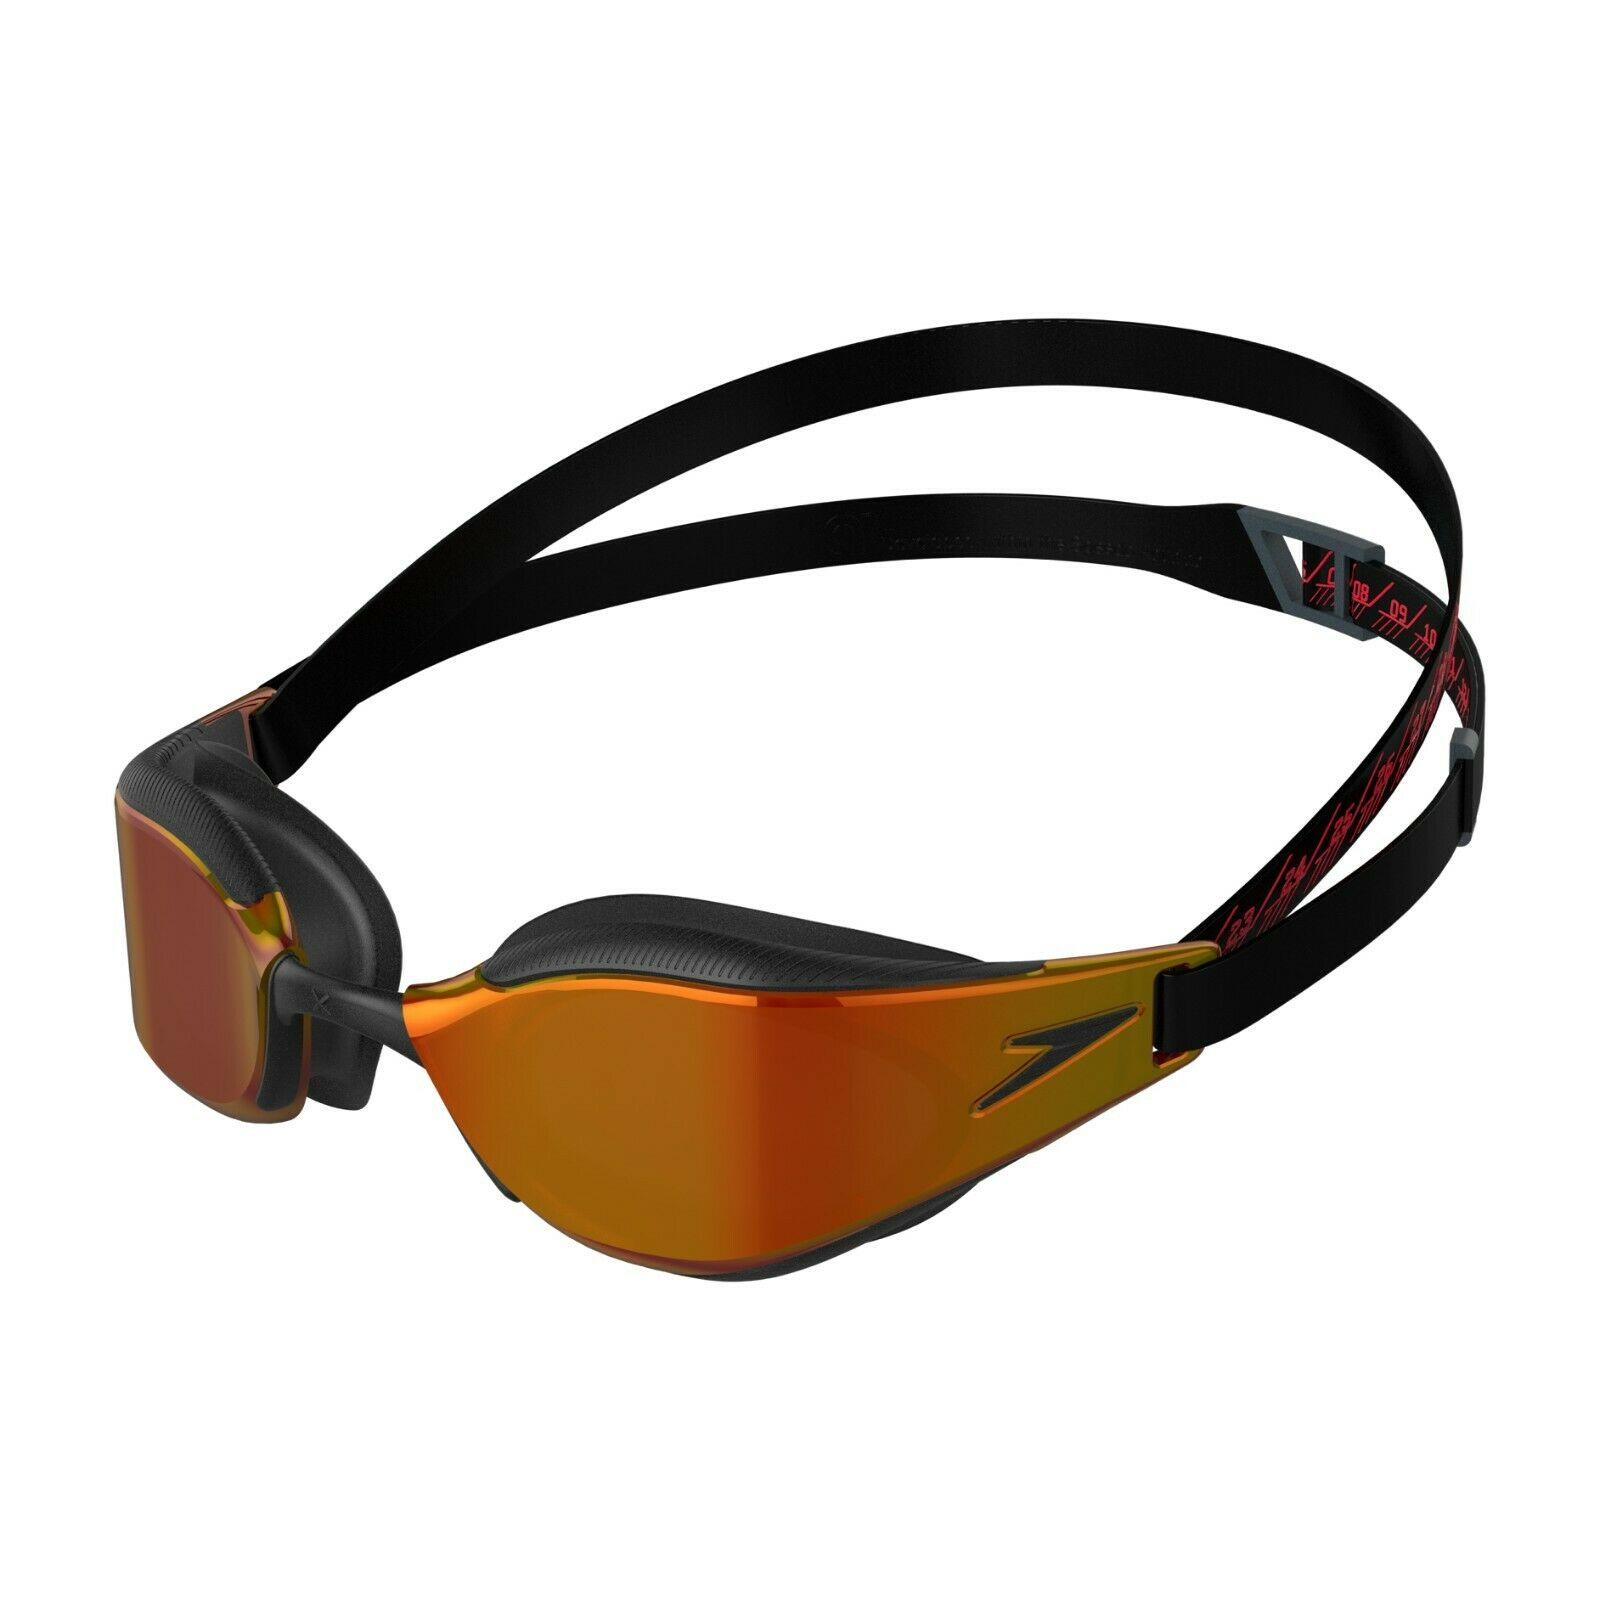 Speedo Fastskin Hyper Elite Mirror Goggles. Speedo Fastskin Goggles.Racing